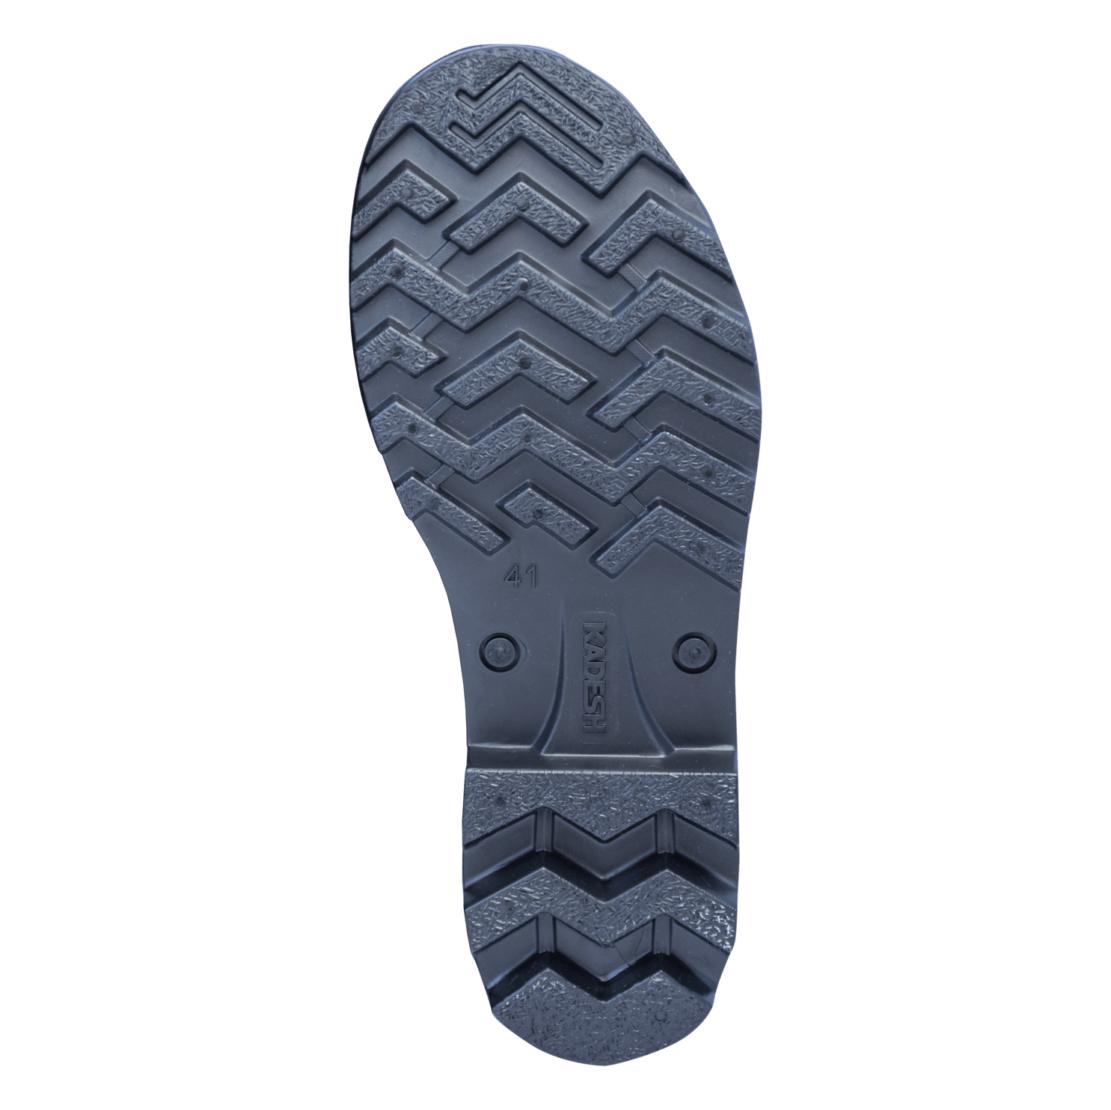 Bota Pvc Preta Safety Boots Cano Médio  Kadesh - B16307